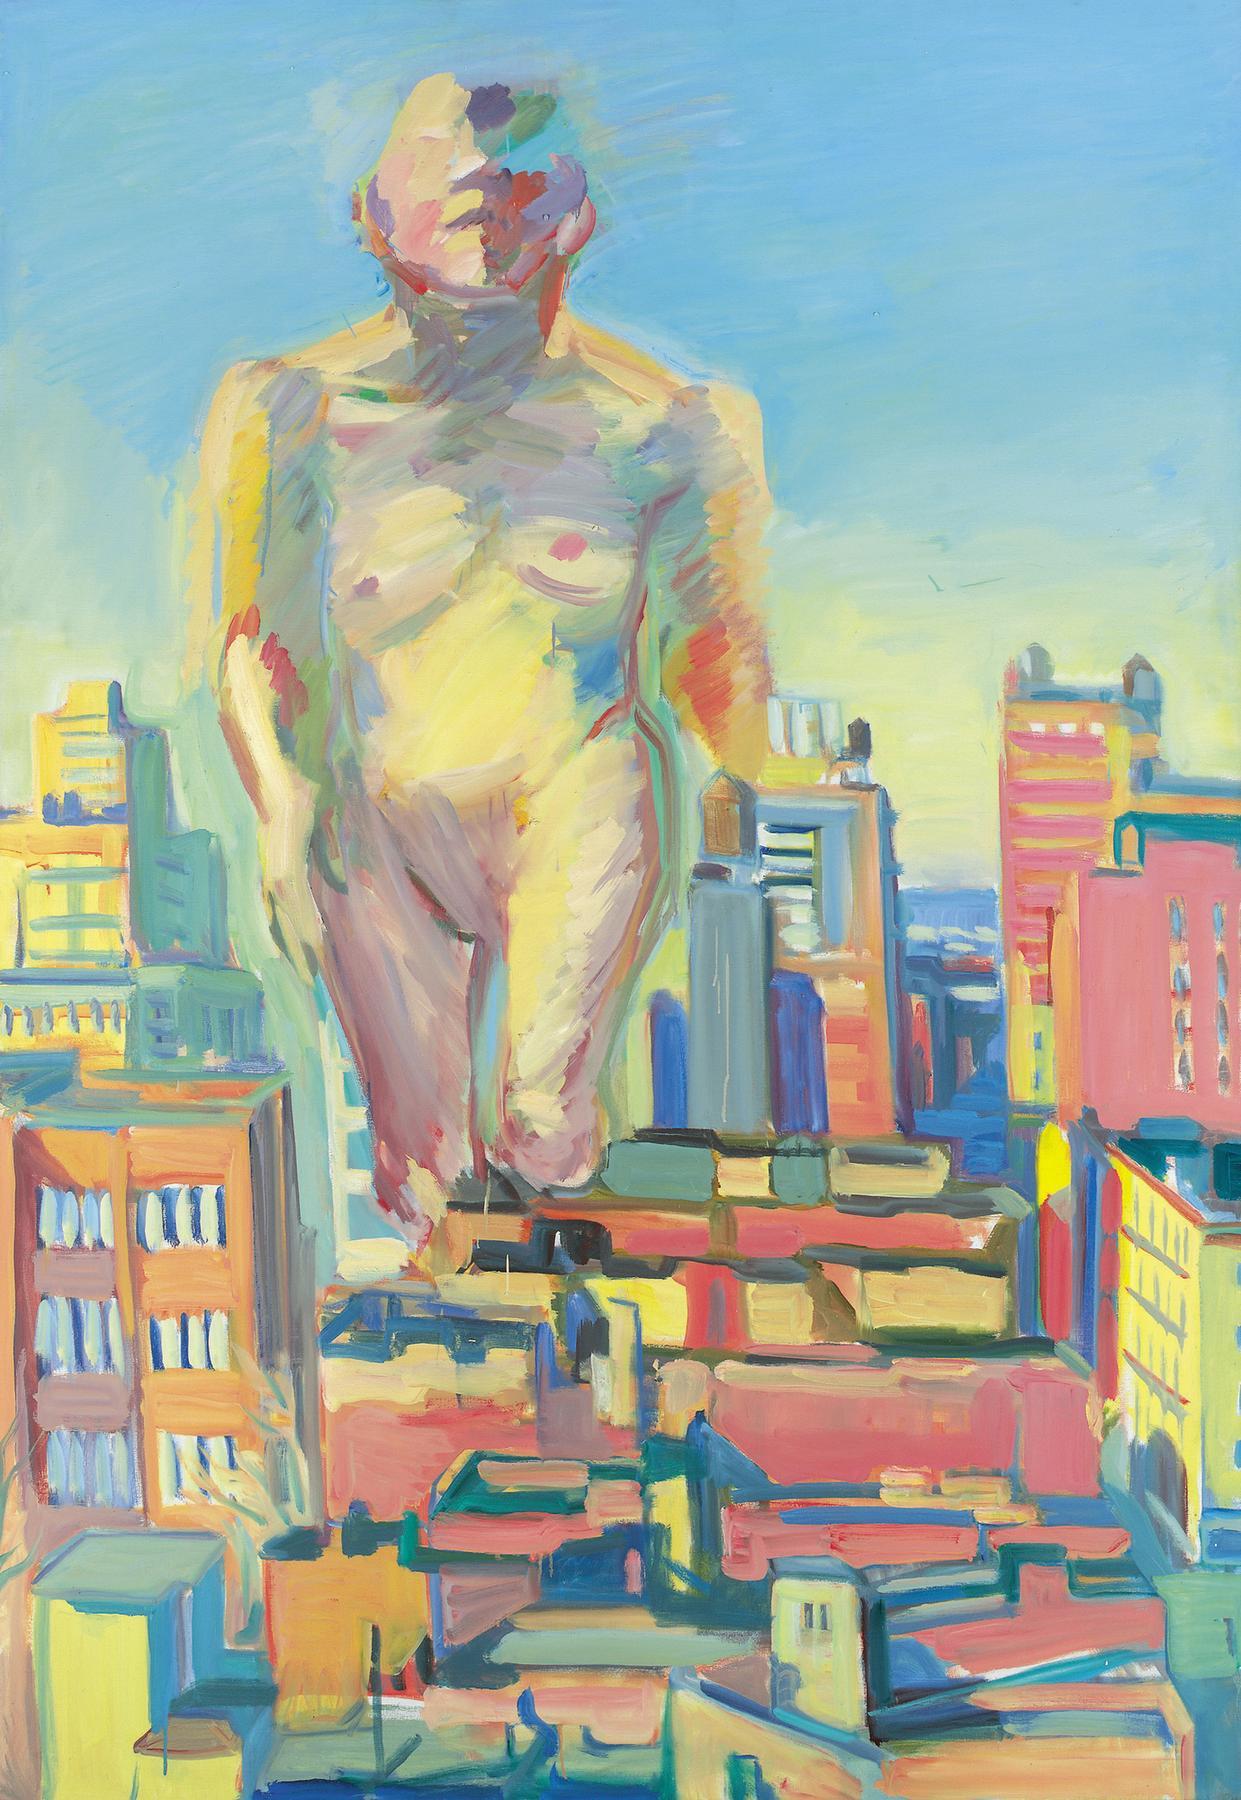 Maria Lassnig. Woman Power, 1979.